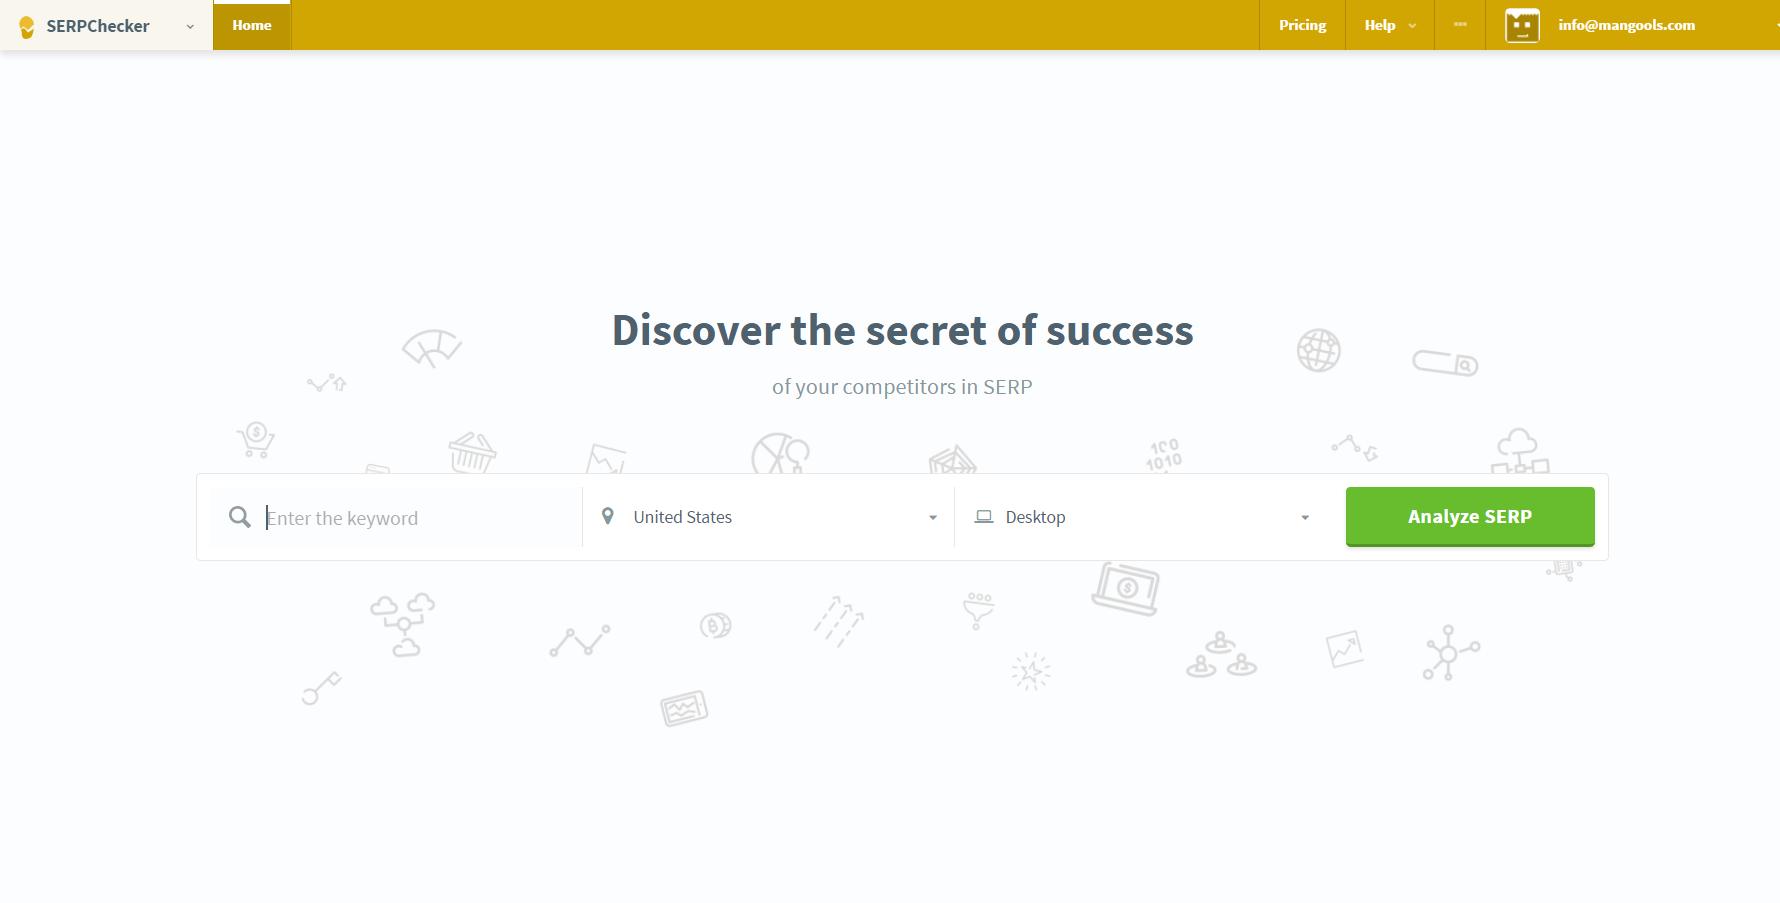 serpchecker mangools landing page application